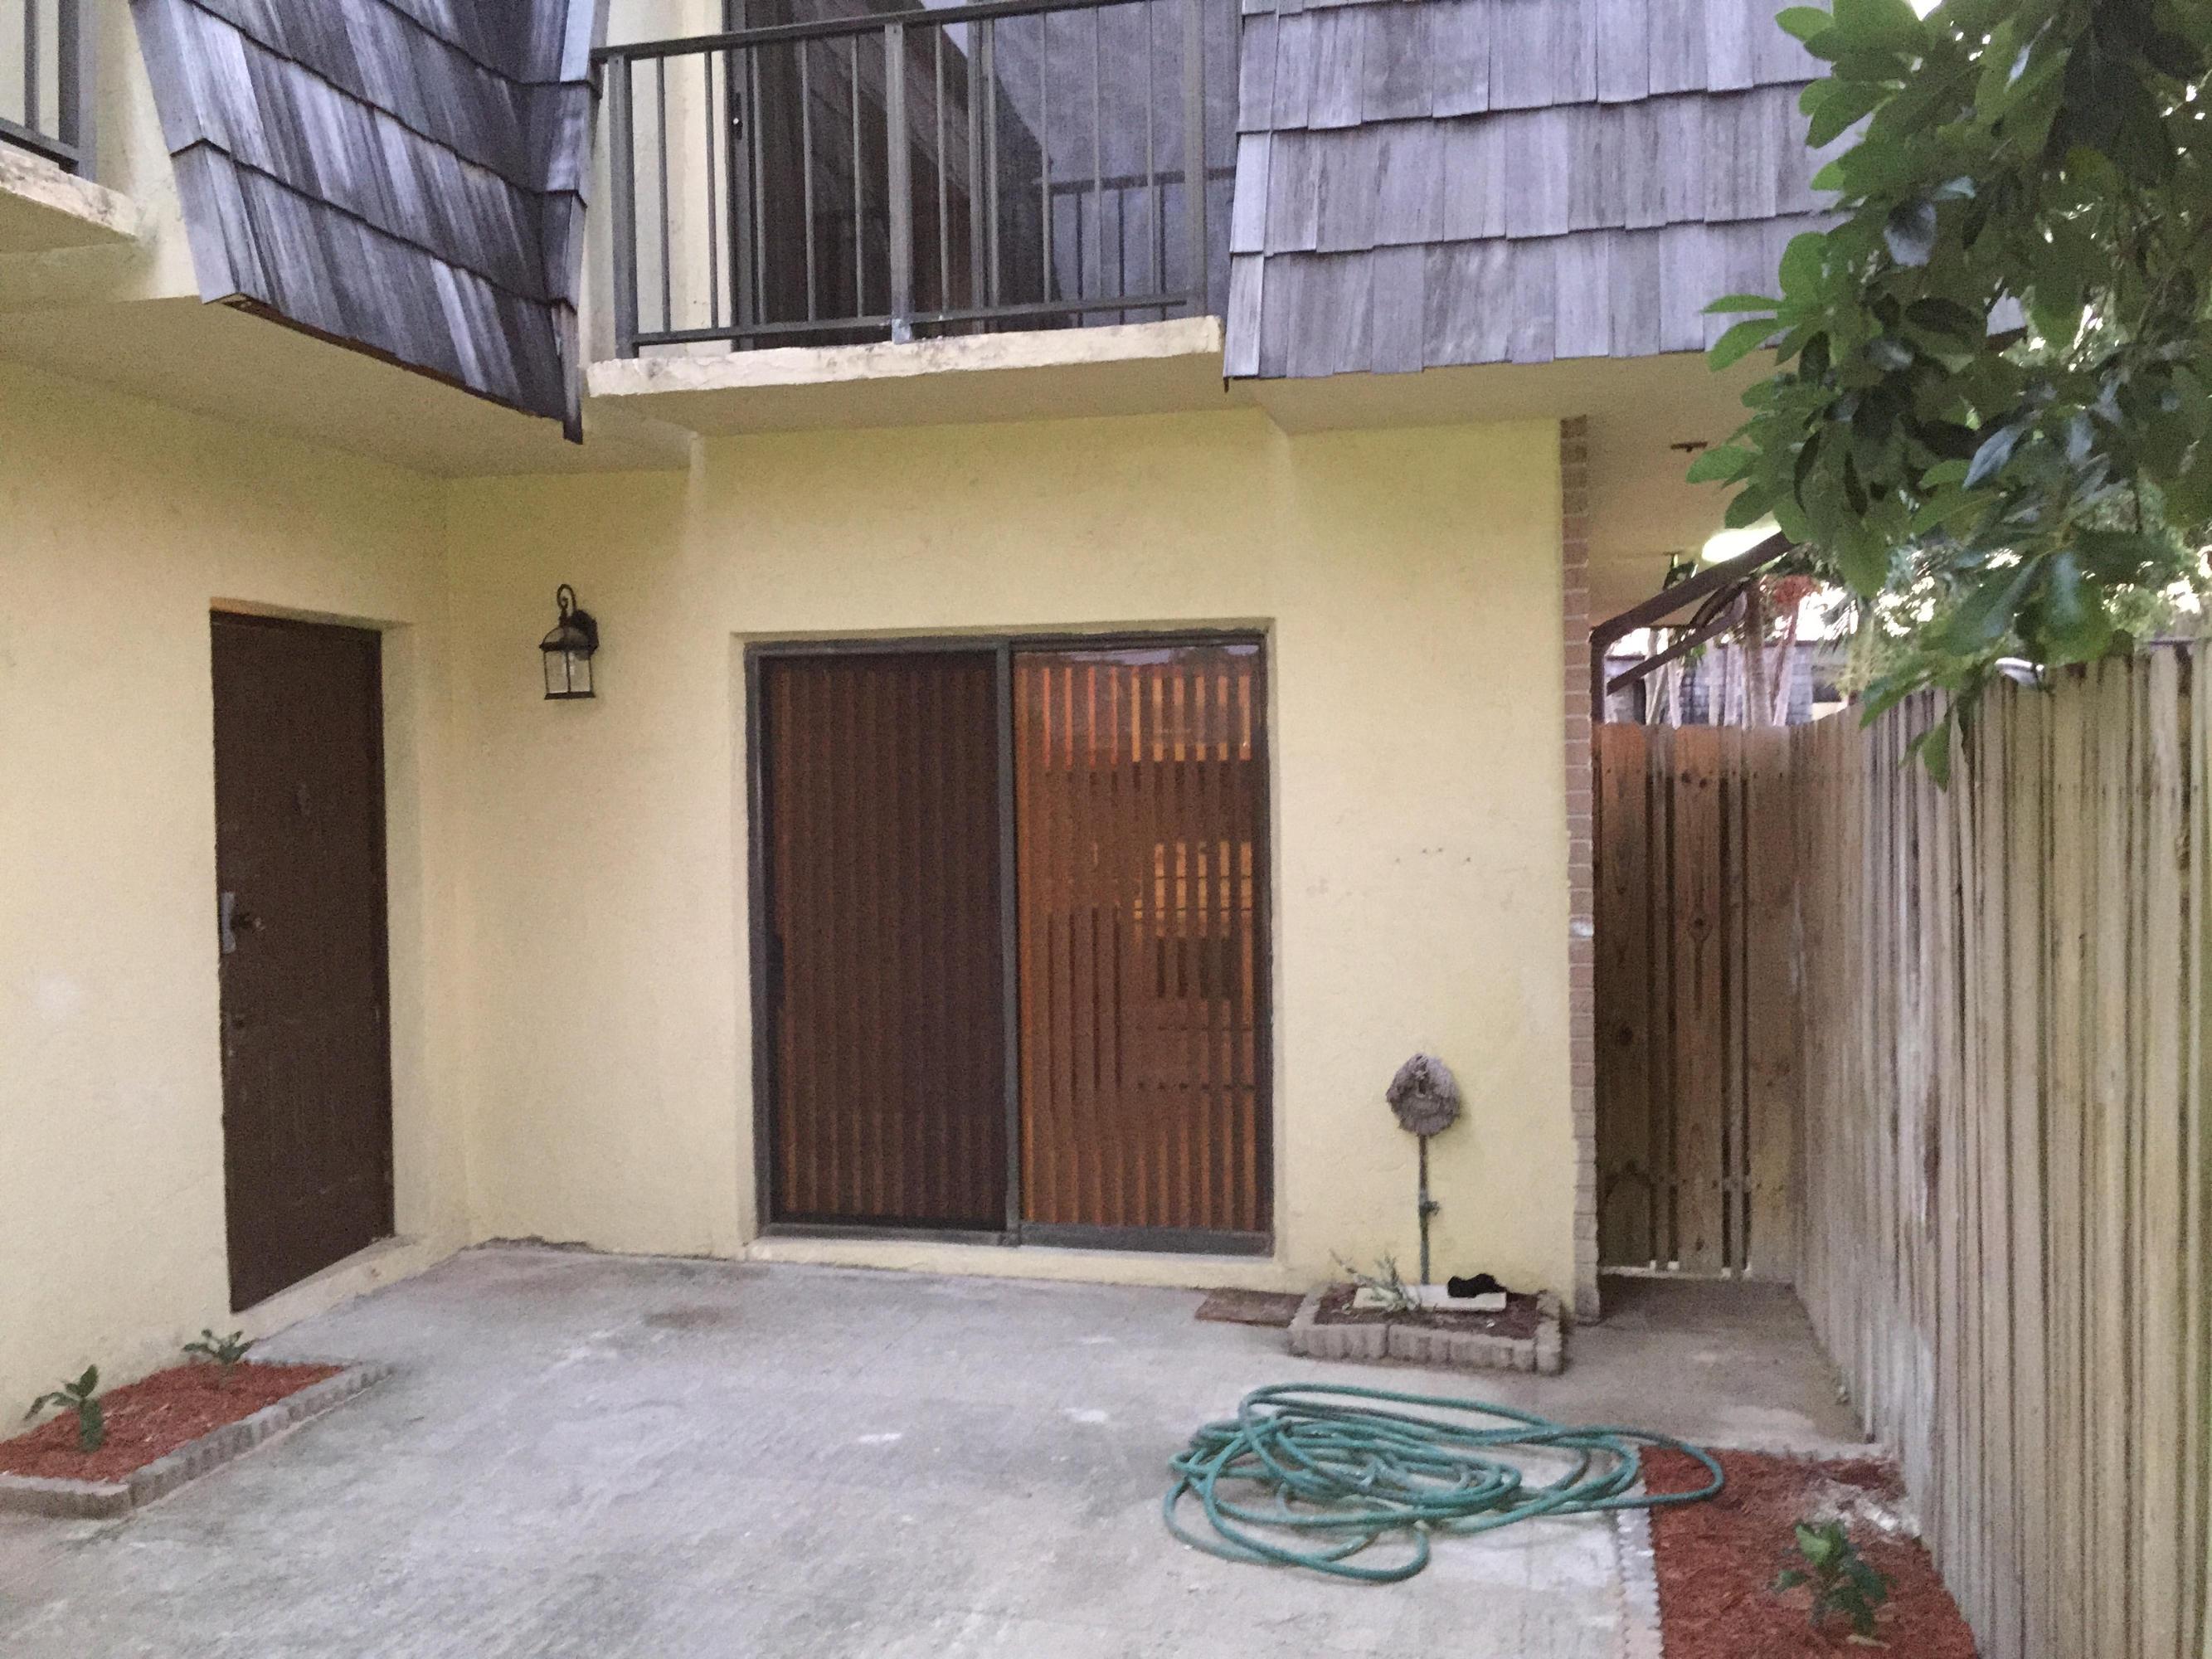 4641 Cherry Road - 33417 - FL - West Palm Beach